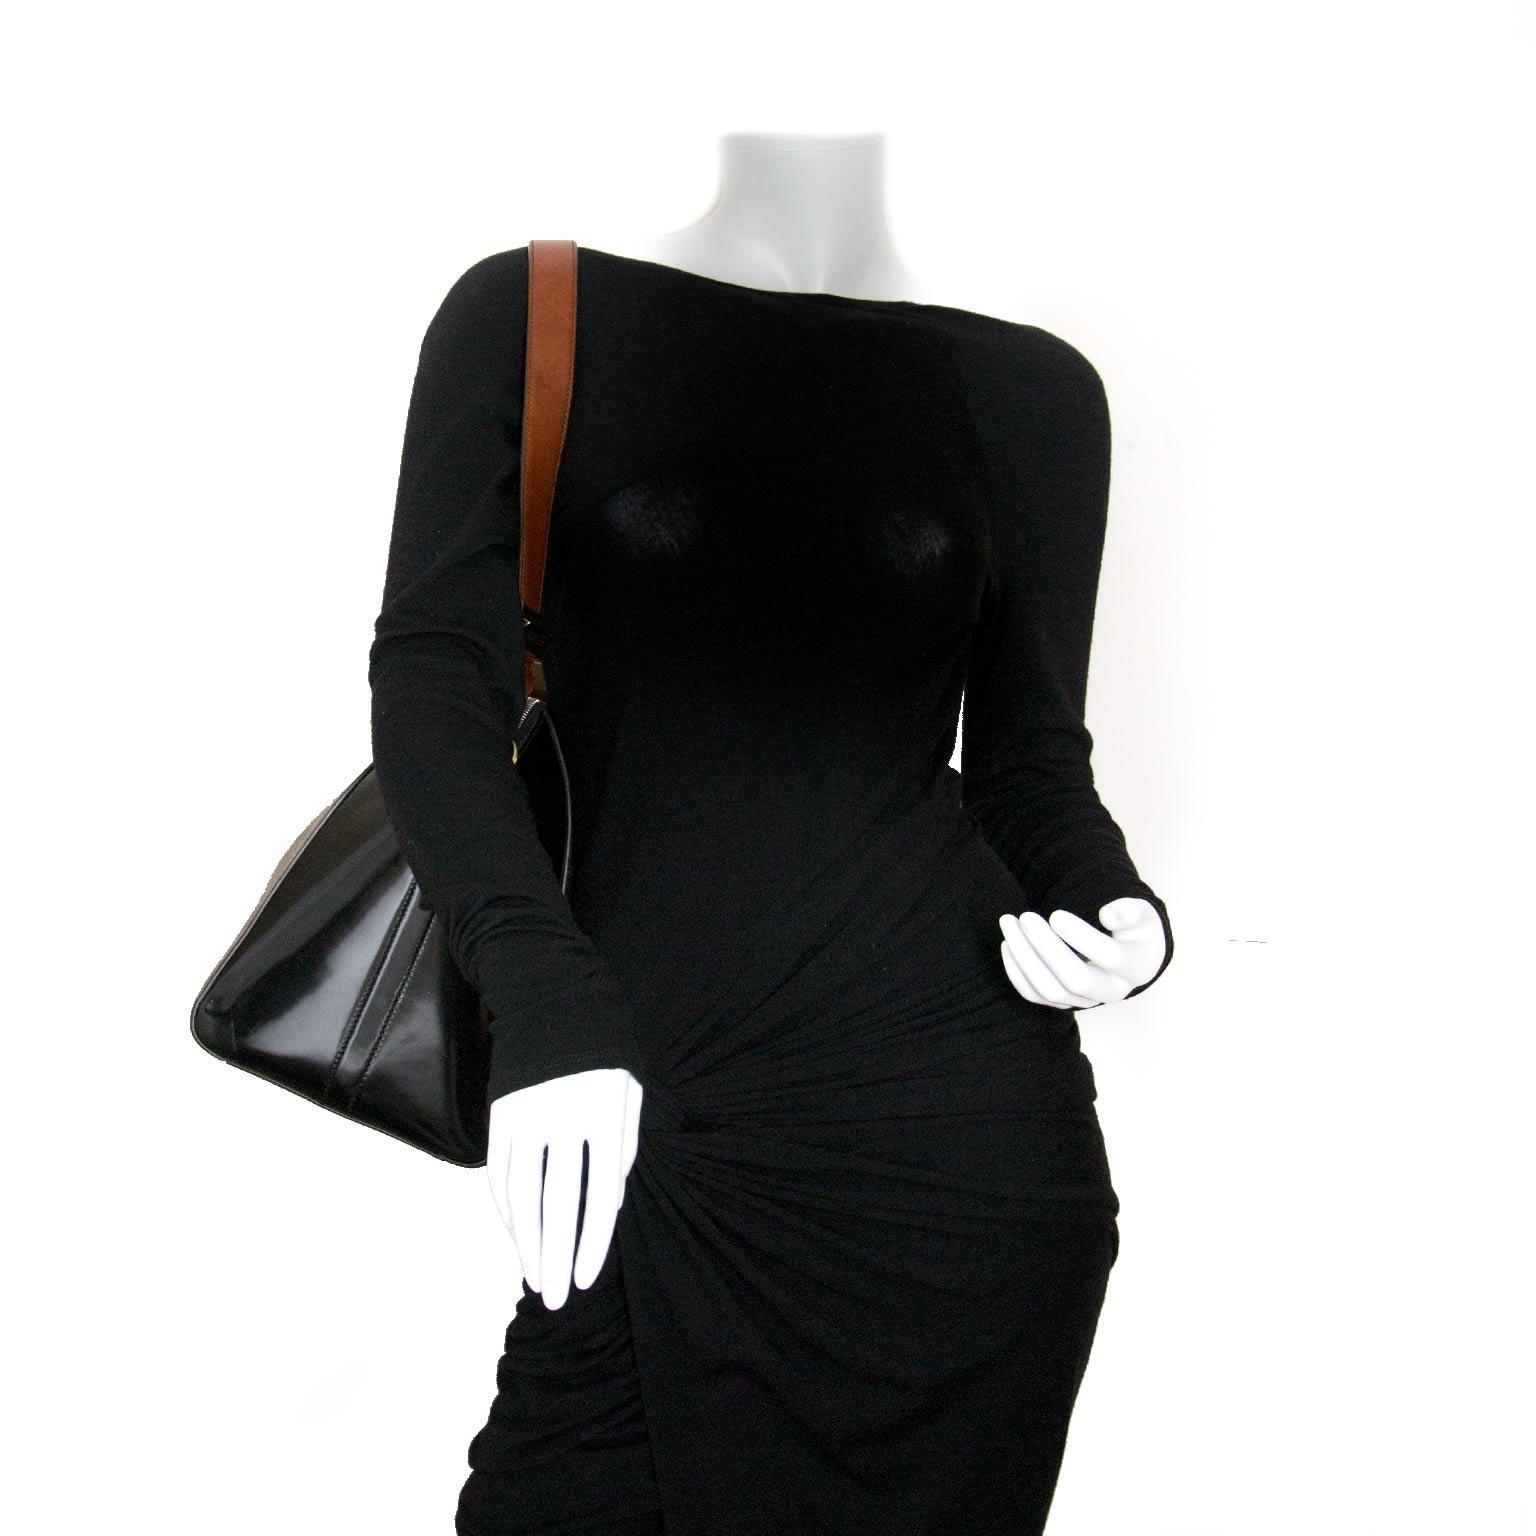 givenchy medium multicolor antigona bag now for sale at labellov vintage fashion webshop belgium